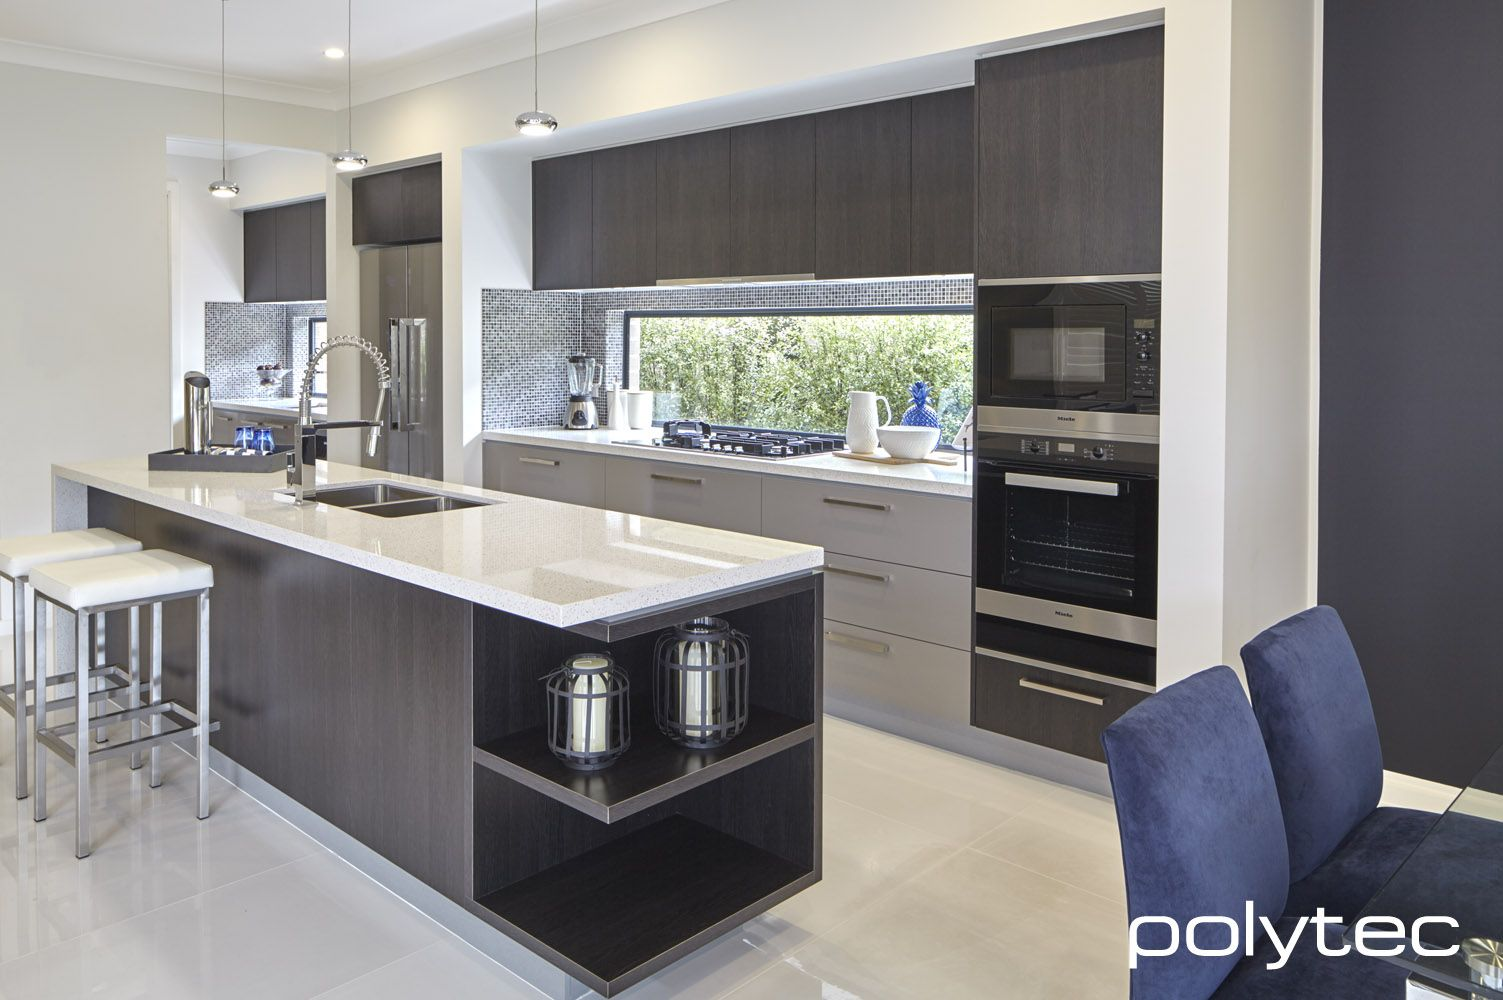 Polytec doors backsplash best polytec inspiration images - Melamine kitchen cabinets ...